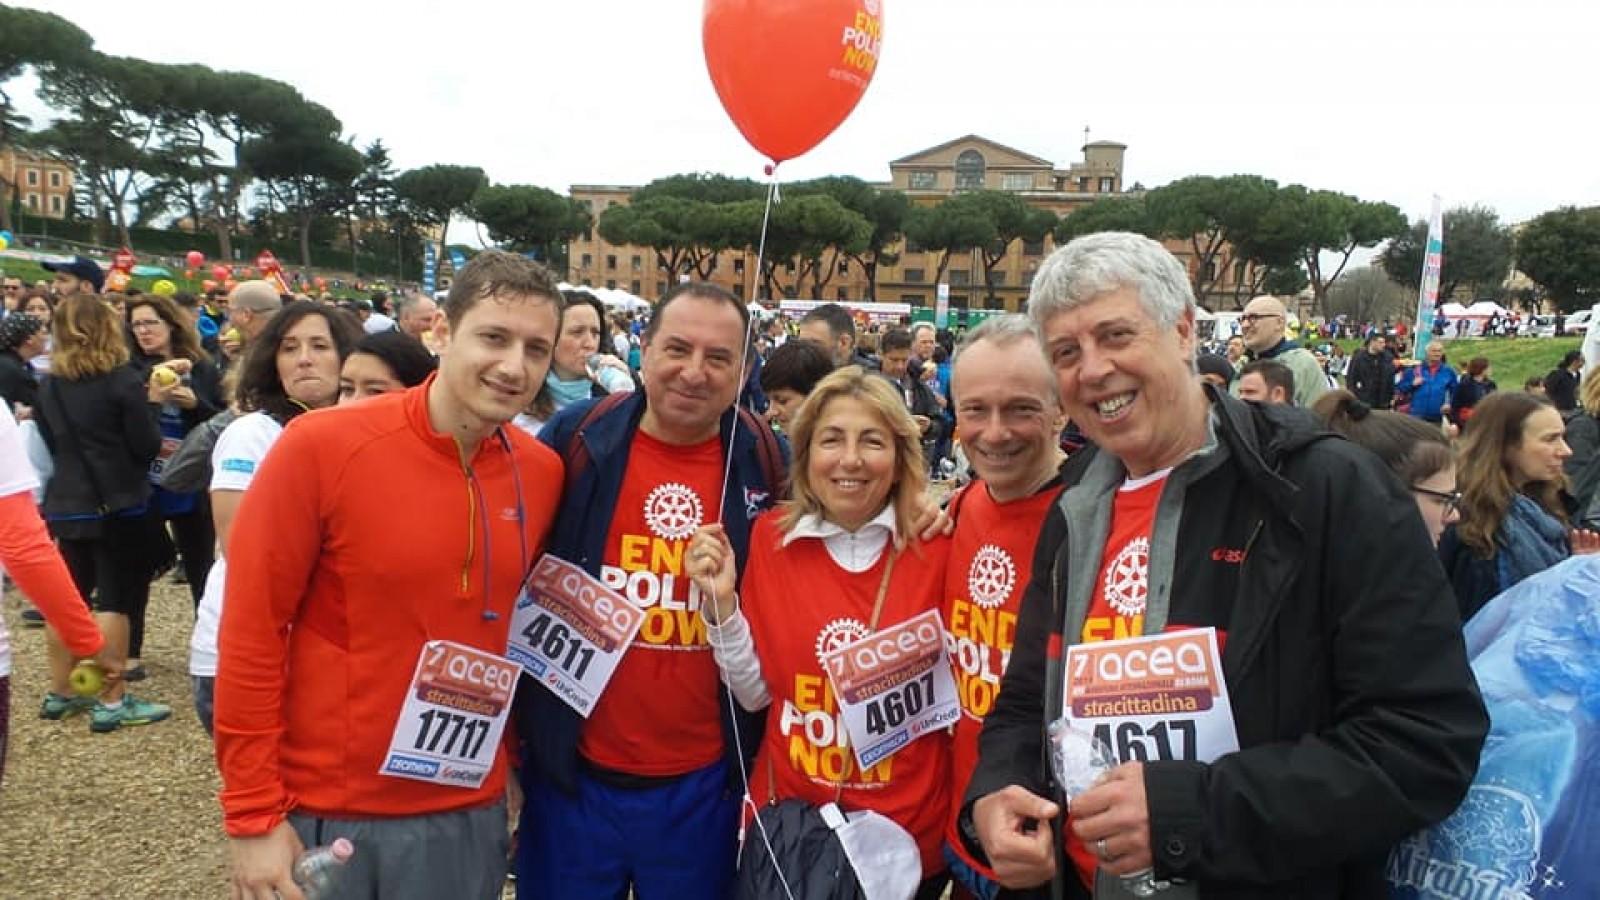 Gallery - Maratona di Roma 2019